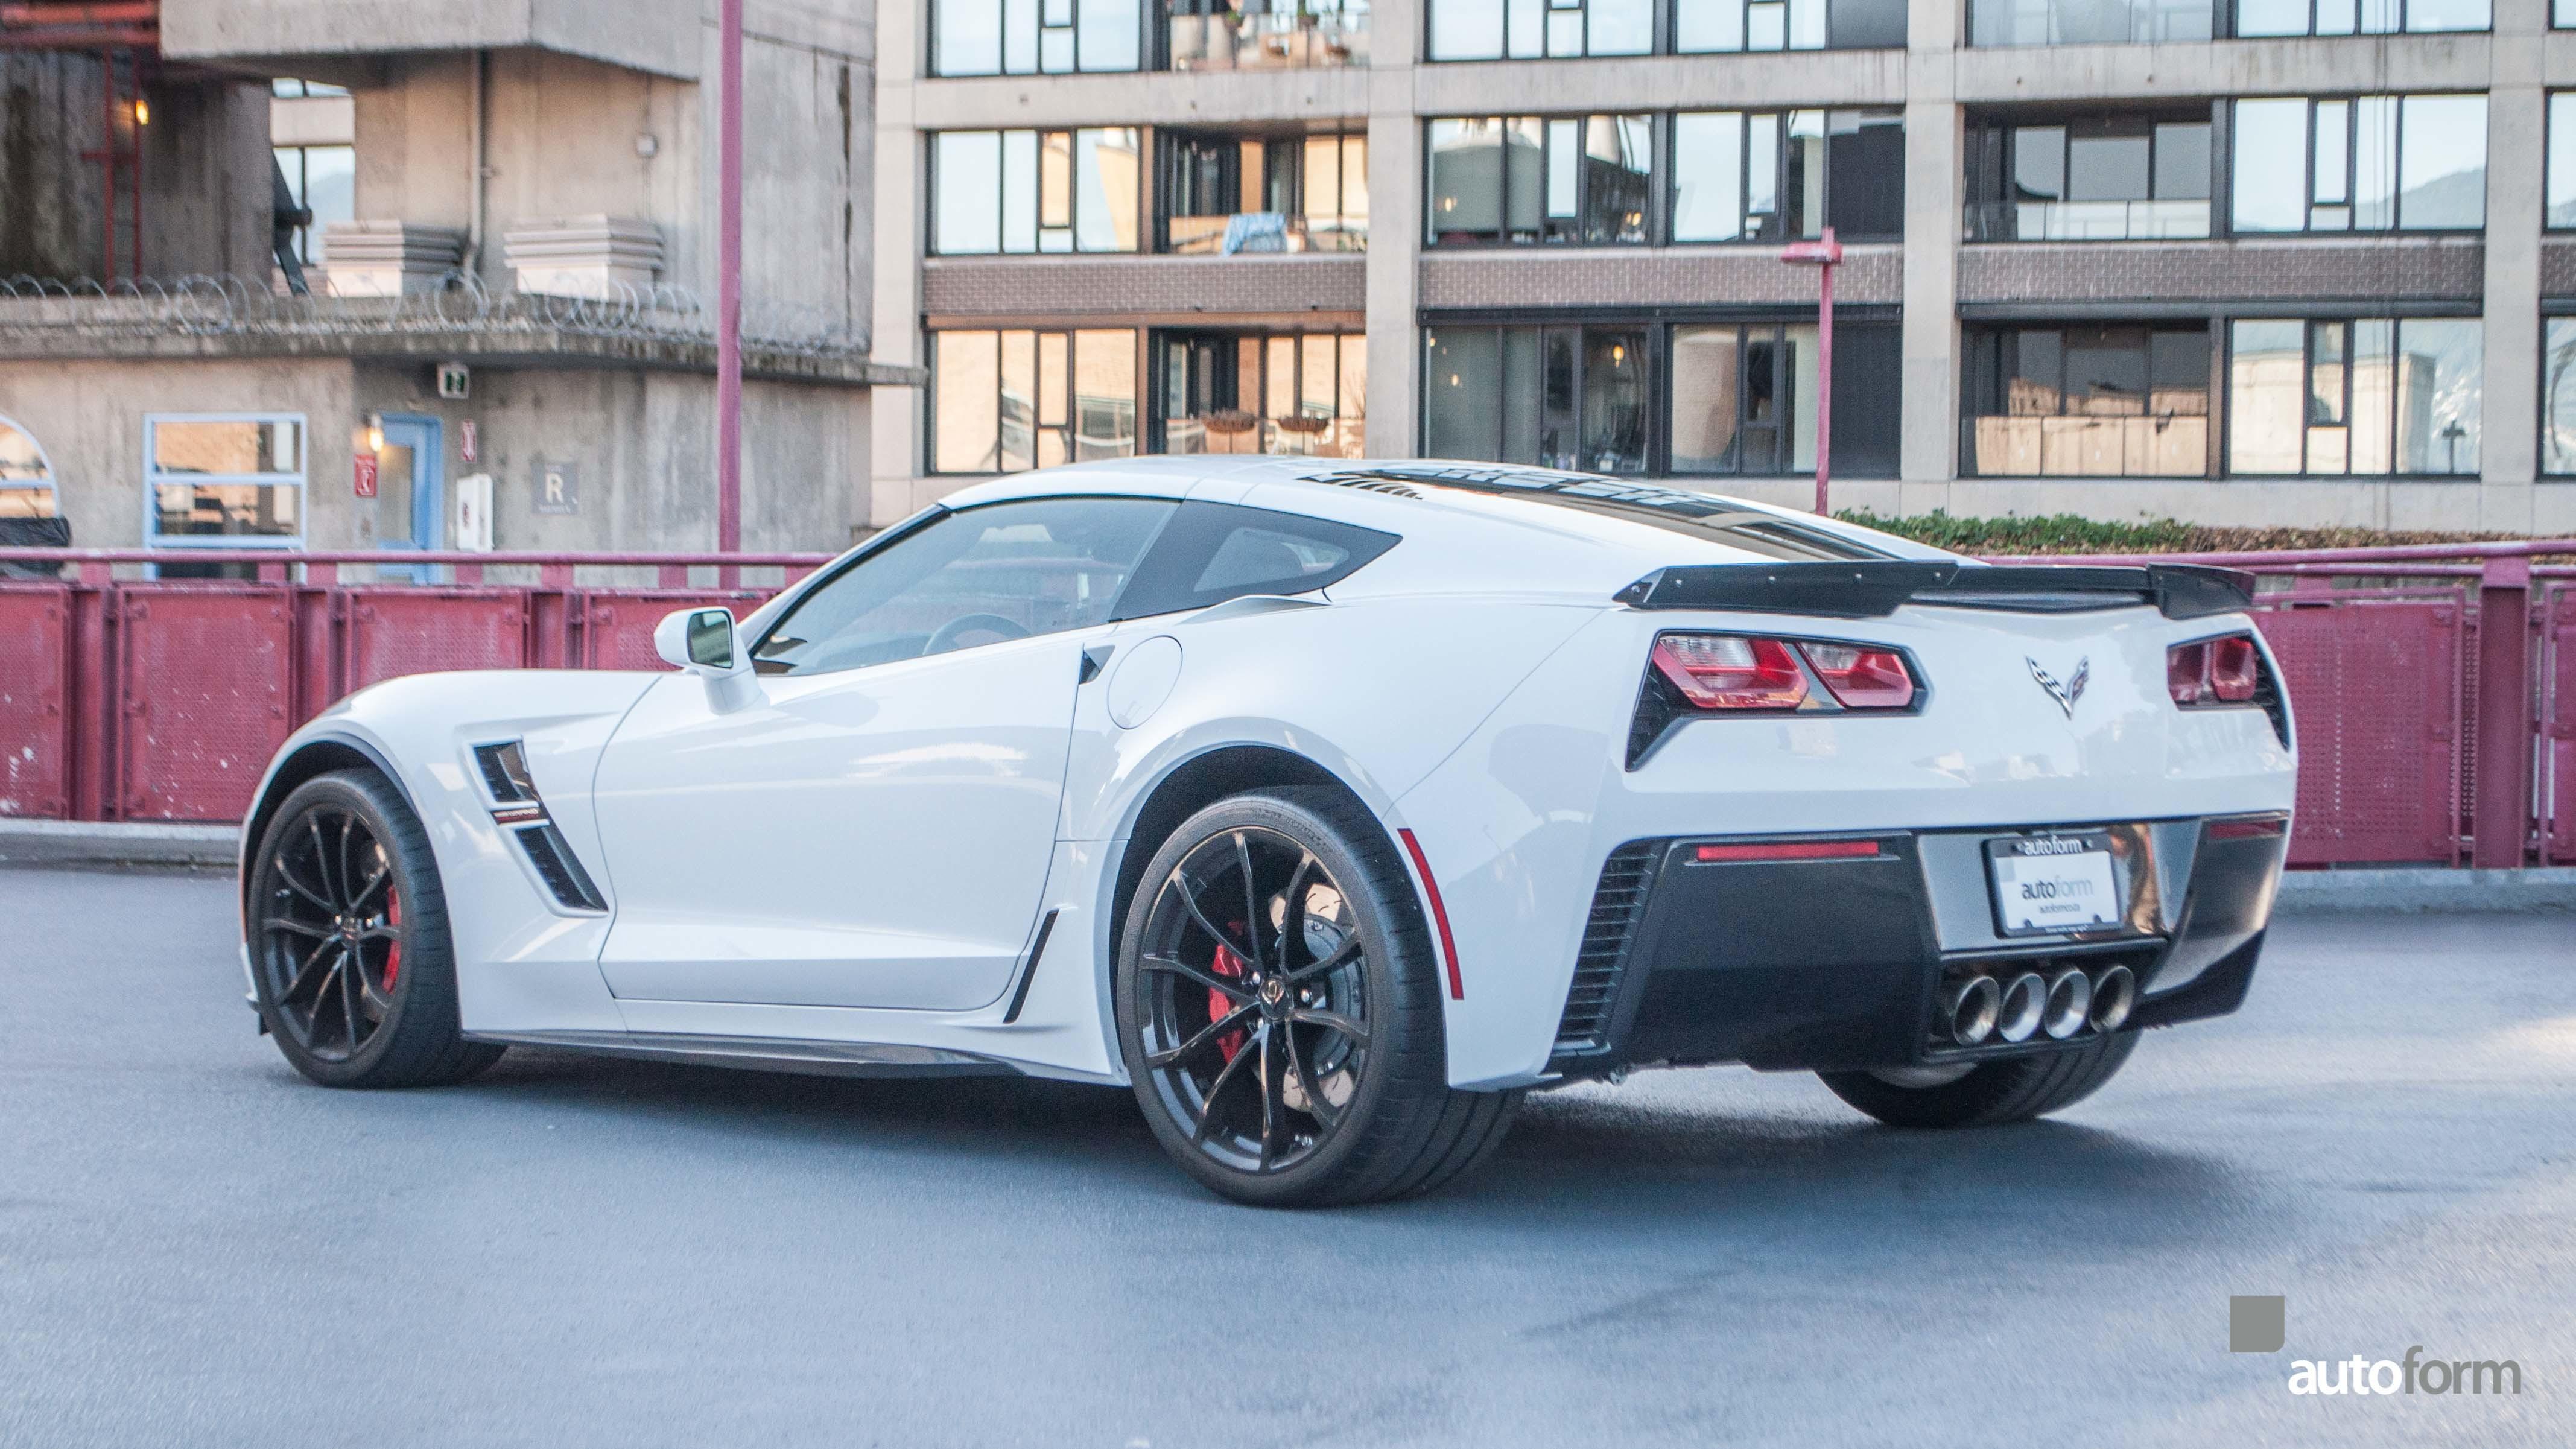 2018 Chevrolet Corvette Grand Sport Autoform